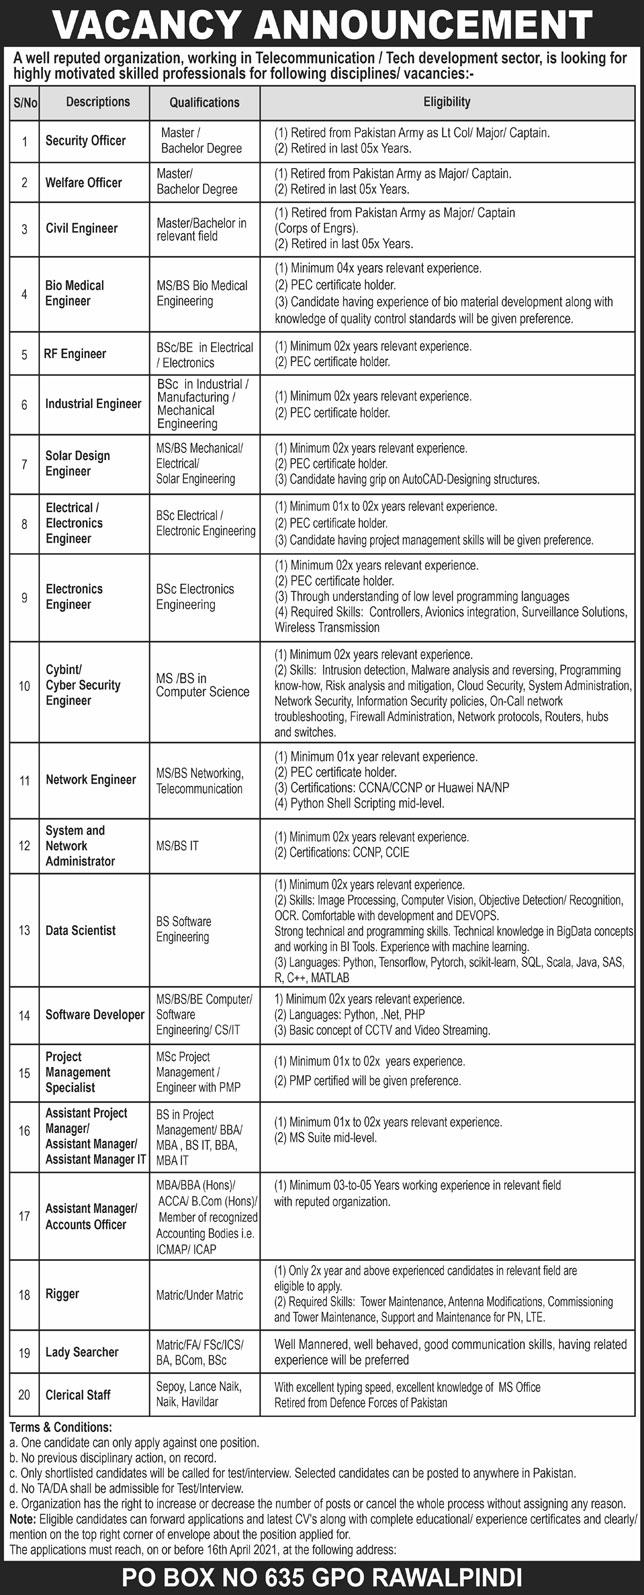 PO Box 635 GPO Rawalpindi Jobs Application Form